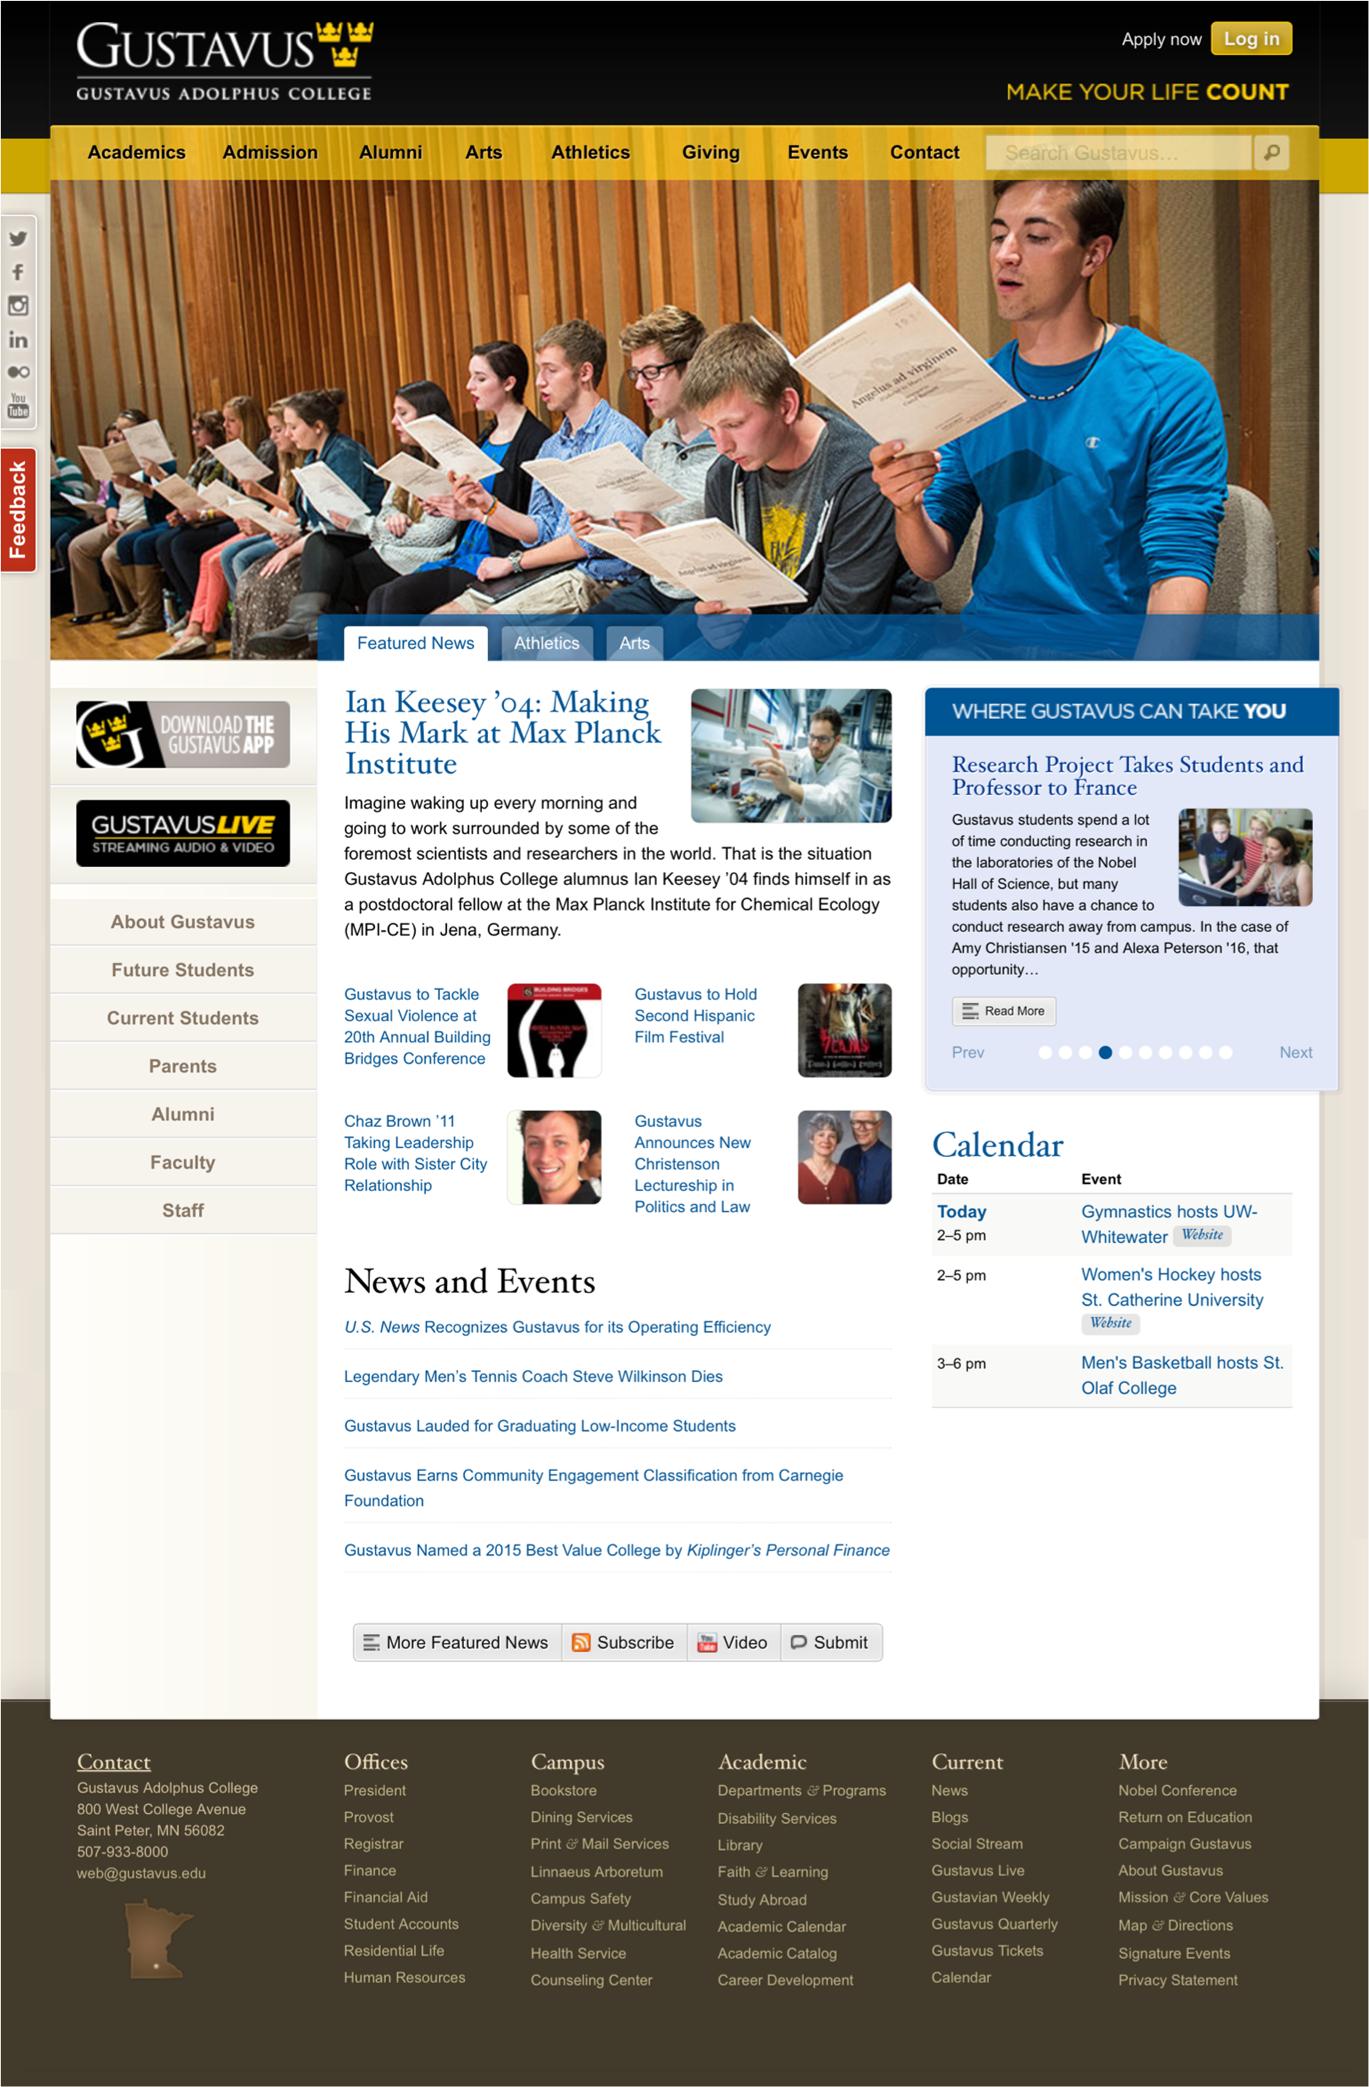 Gustavus Adolphus College's main page